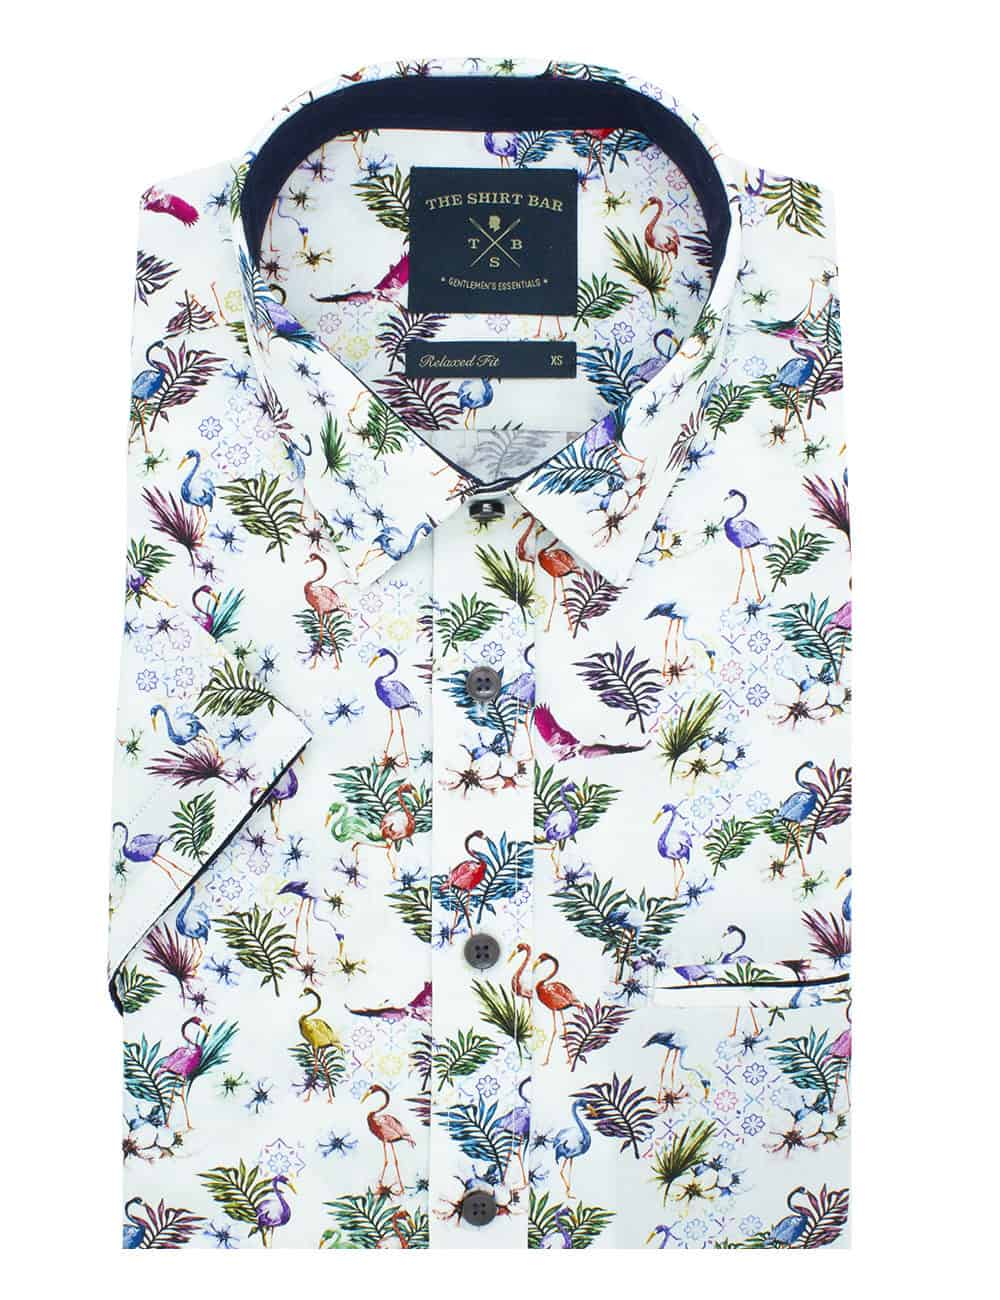 Relaxed FitPremium Italian Fabric Digitally Printed Short Sleeve Men's Shirt